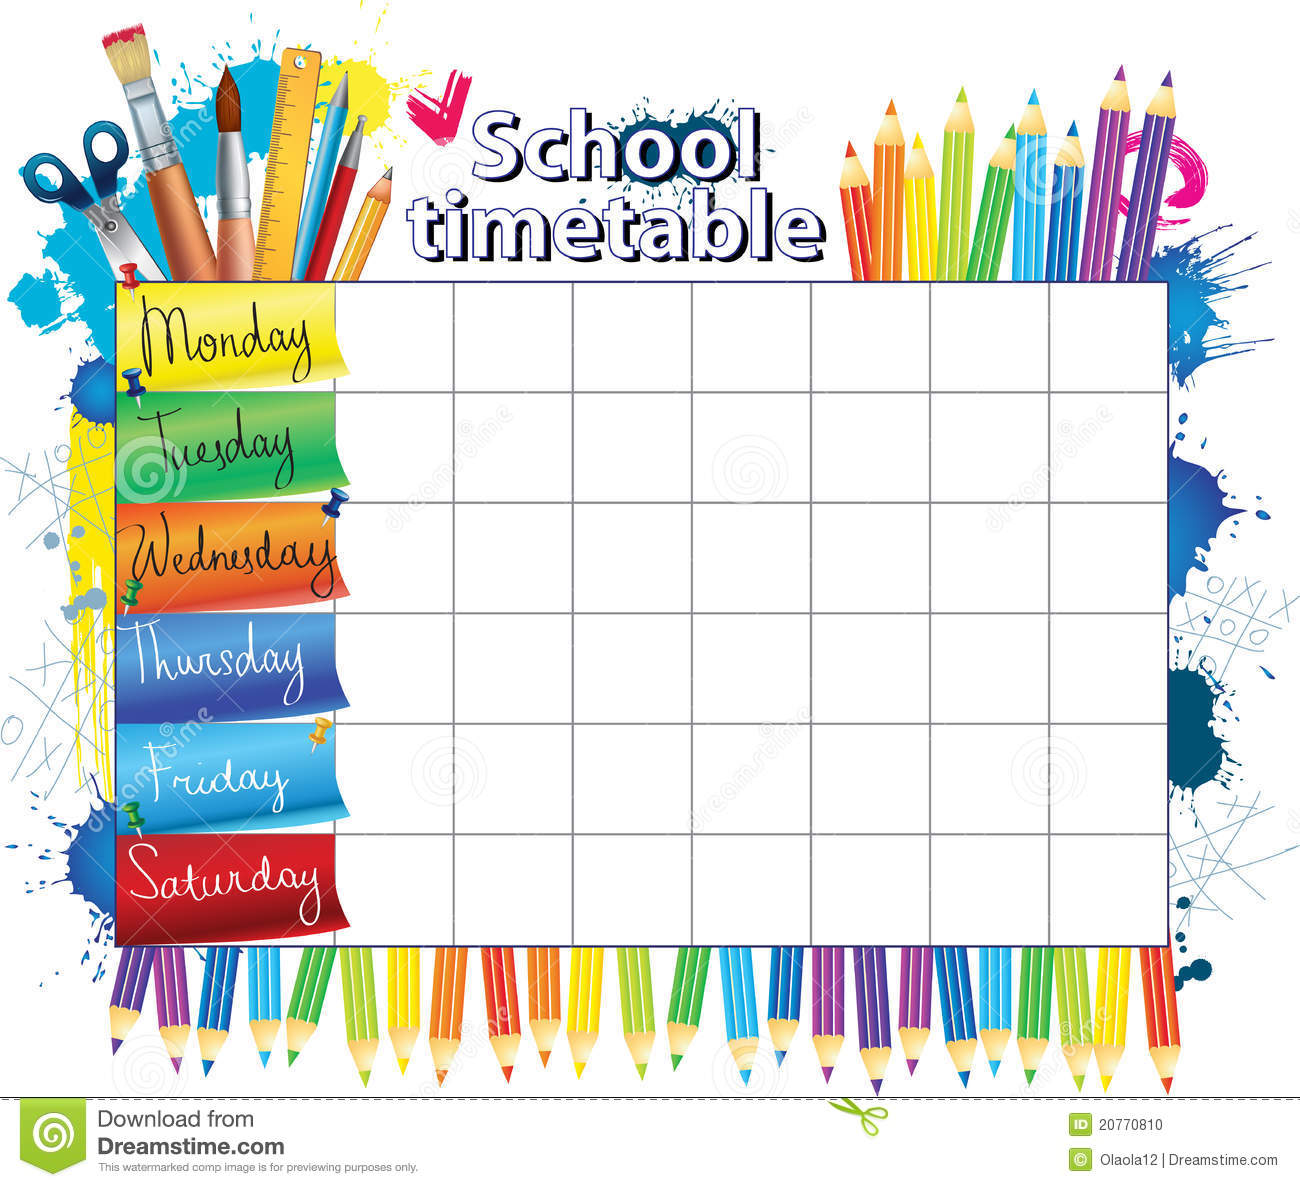 School timetable clipart.